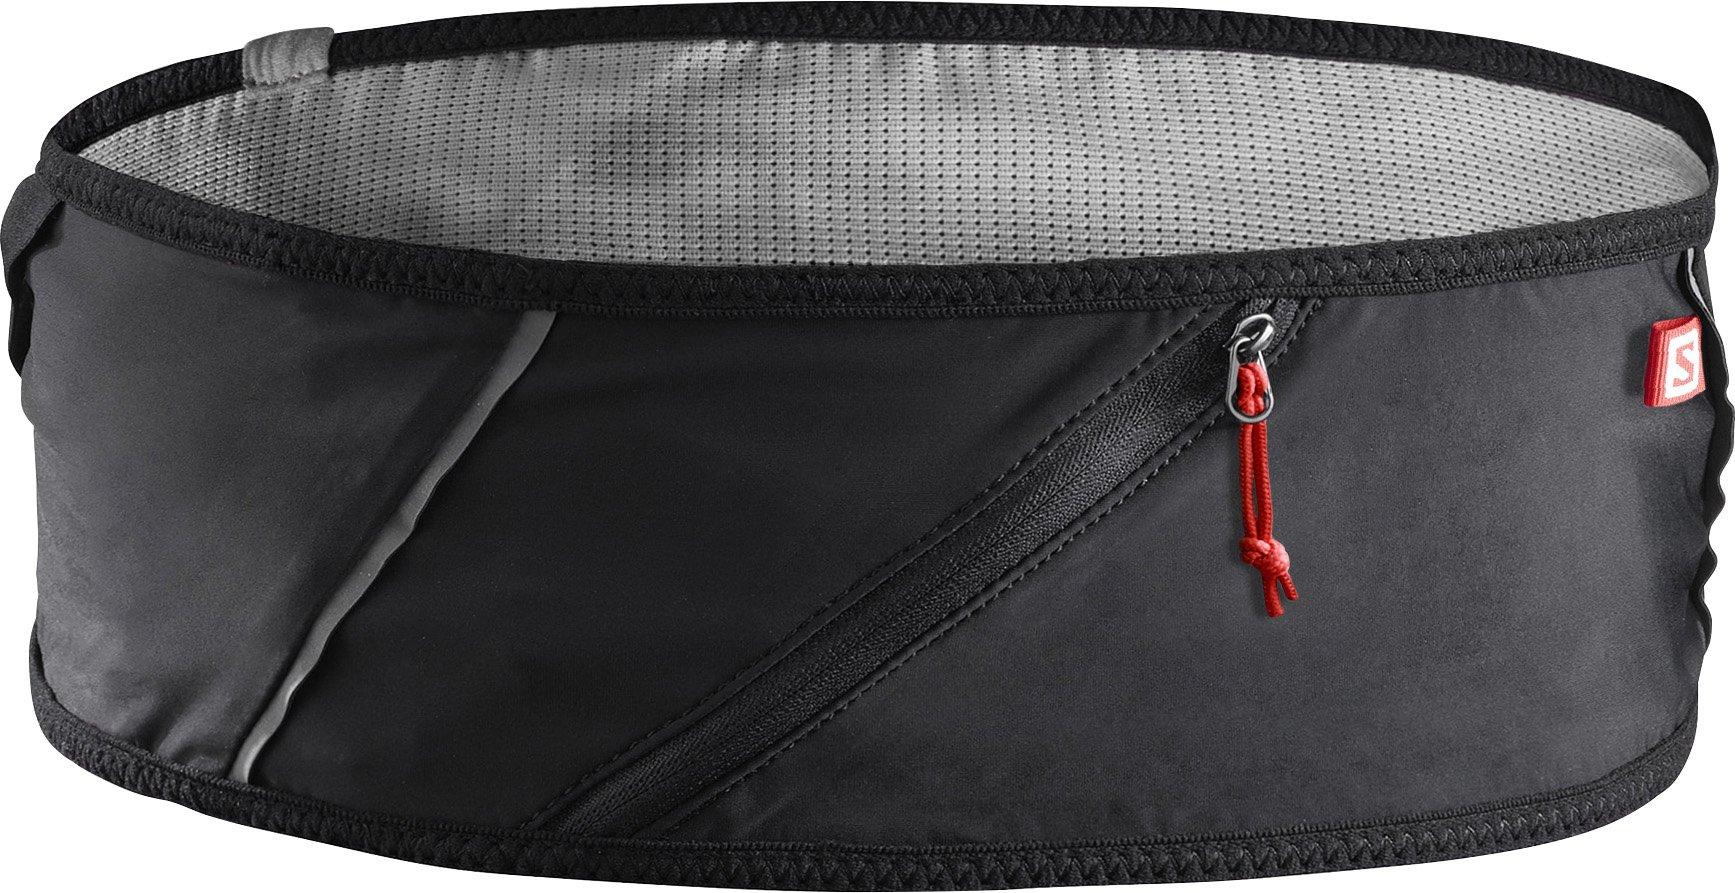 Salomon Unisex Pulse Belt, Black, Small